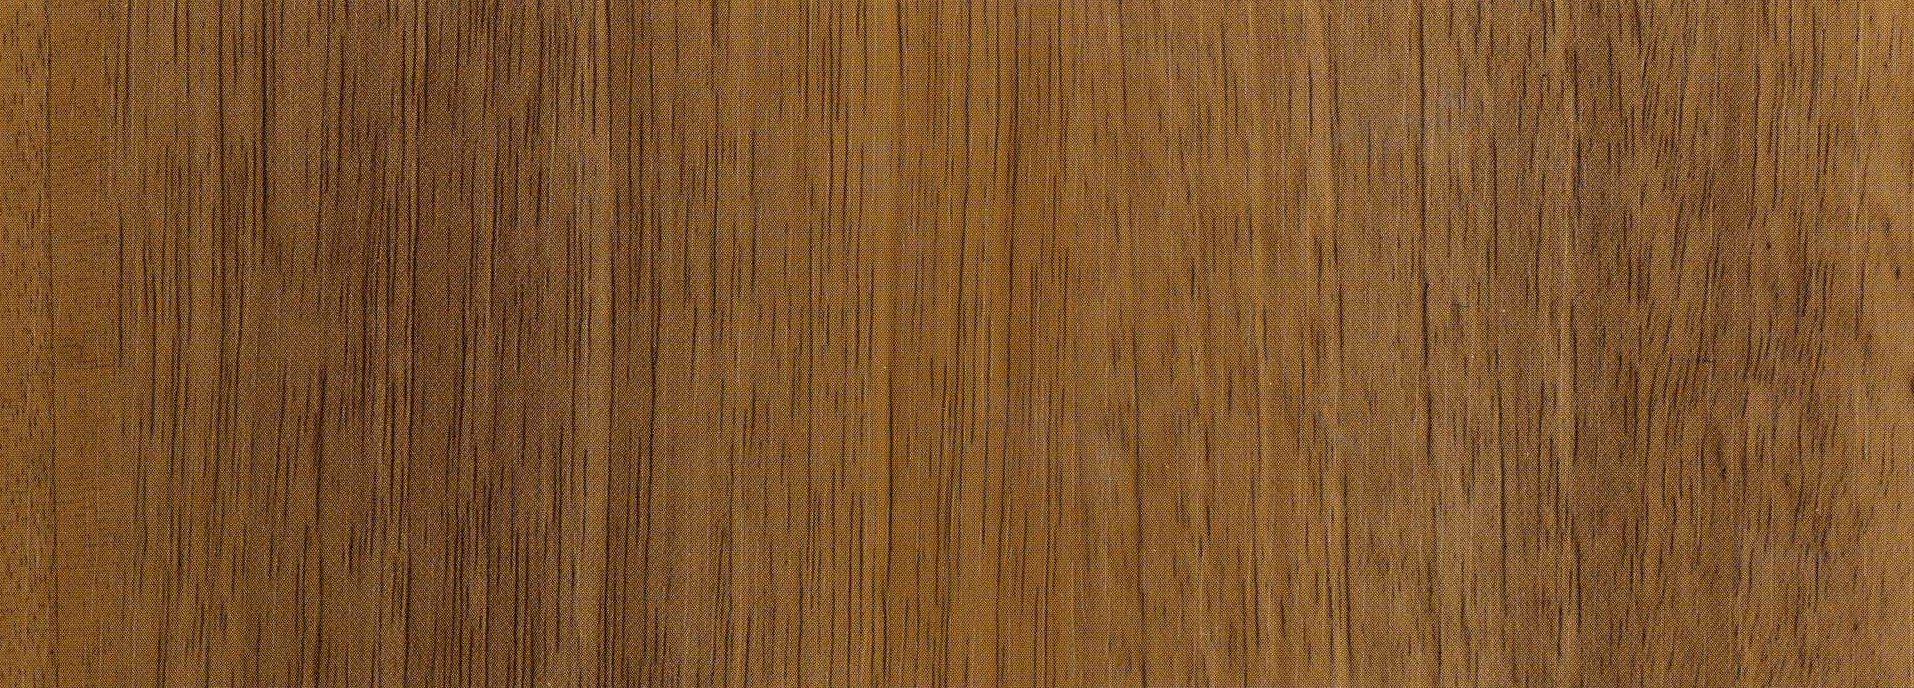 Plakfolie Noten 3885 - 67,5cm x 15m